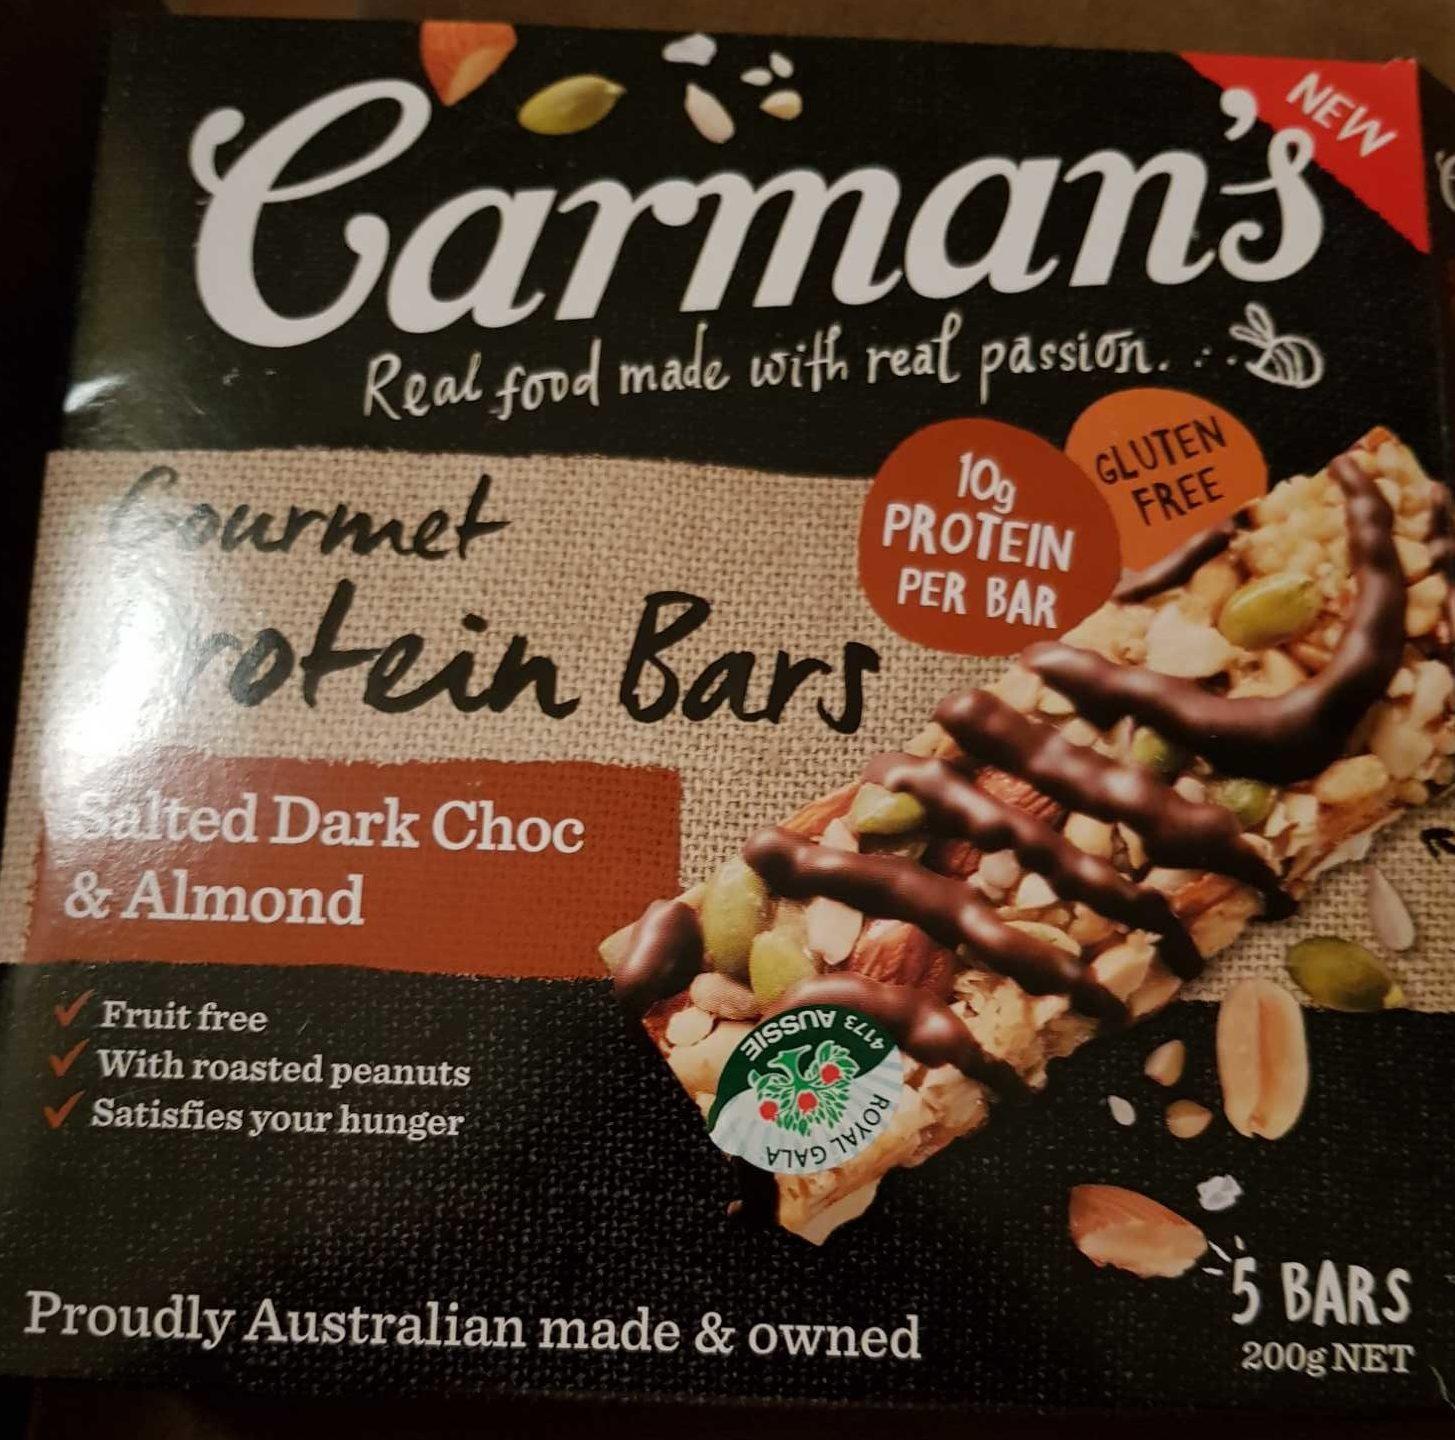 Carman's Gourmet Protein Bars Salted Dark Choc & Almond - Product